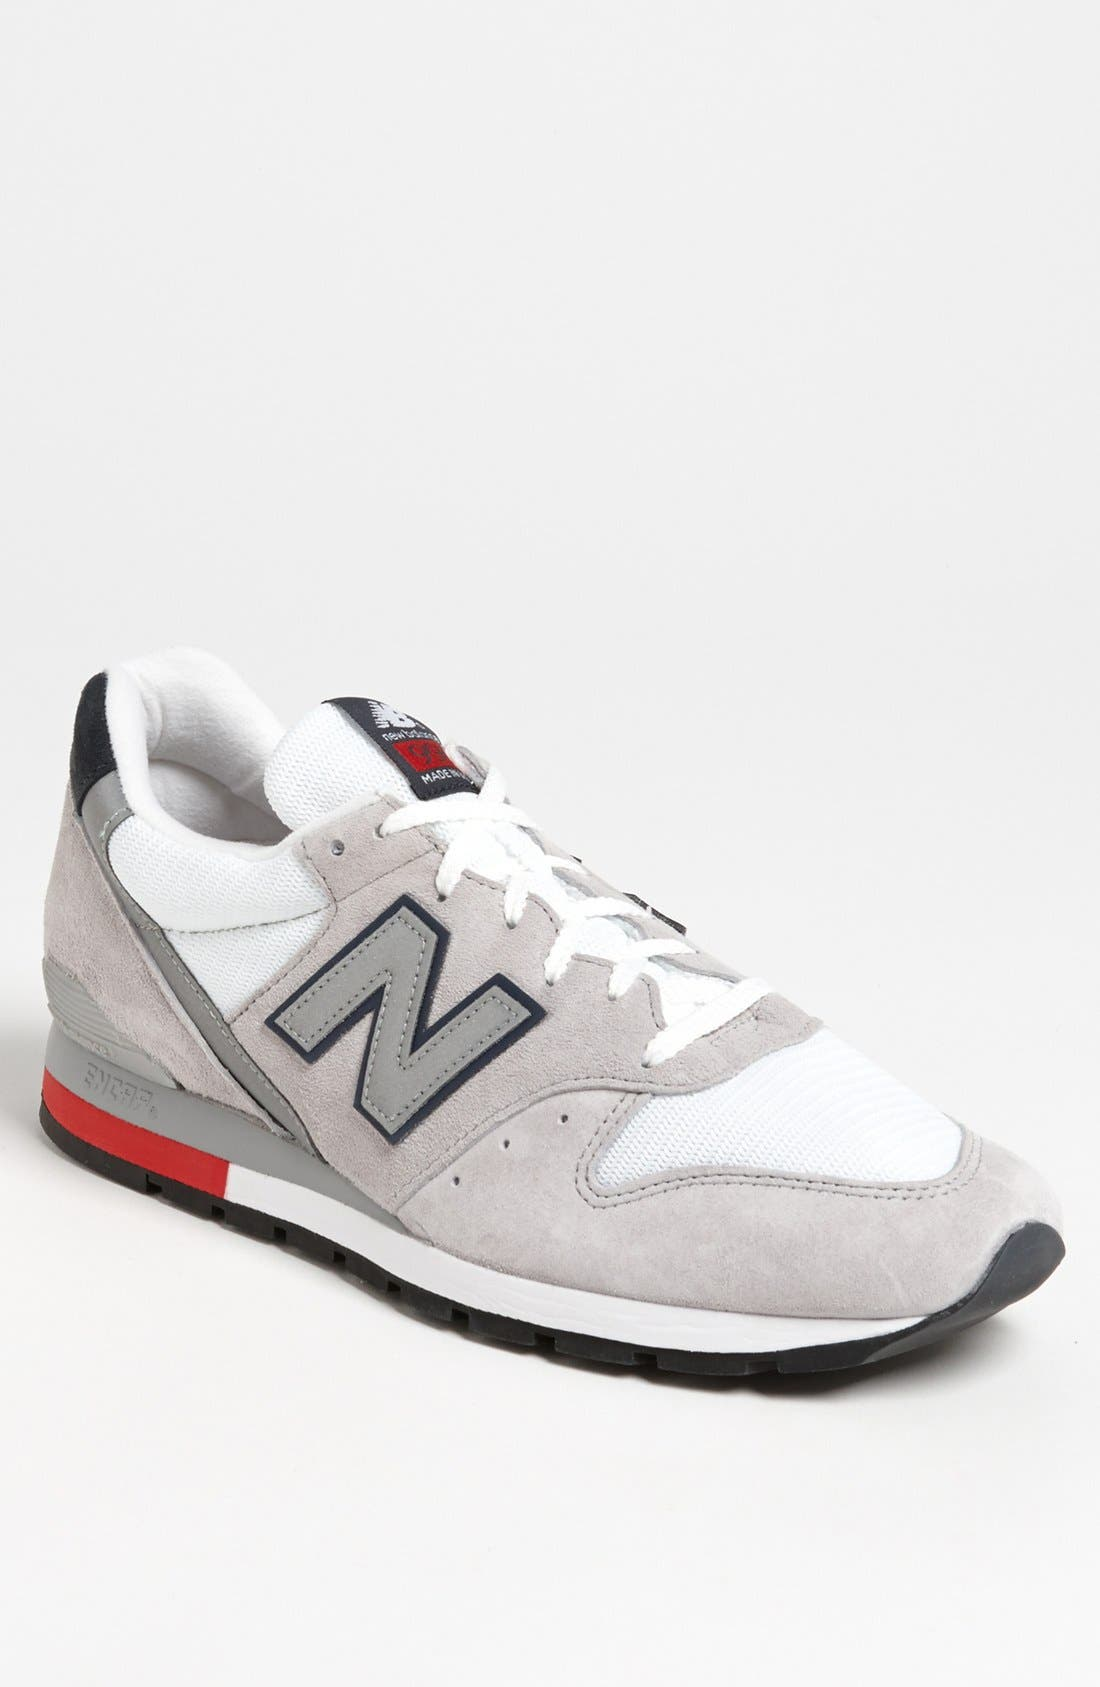 Alternate Image 1 Selected - New Balance '996 Classic' Sneaker (Men)